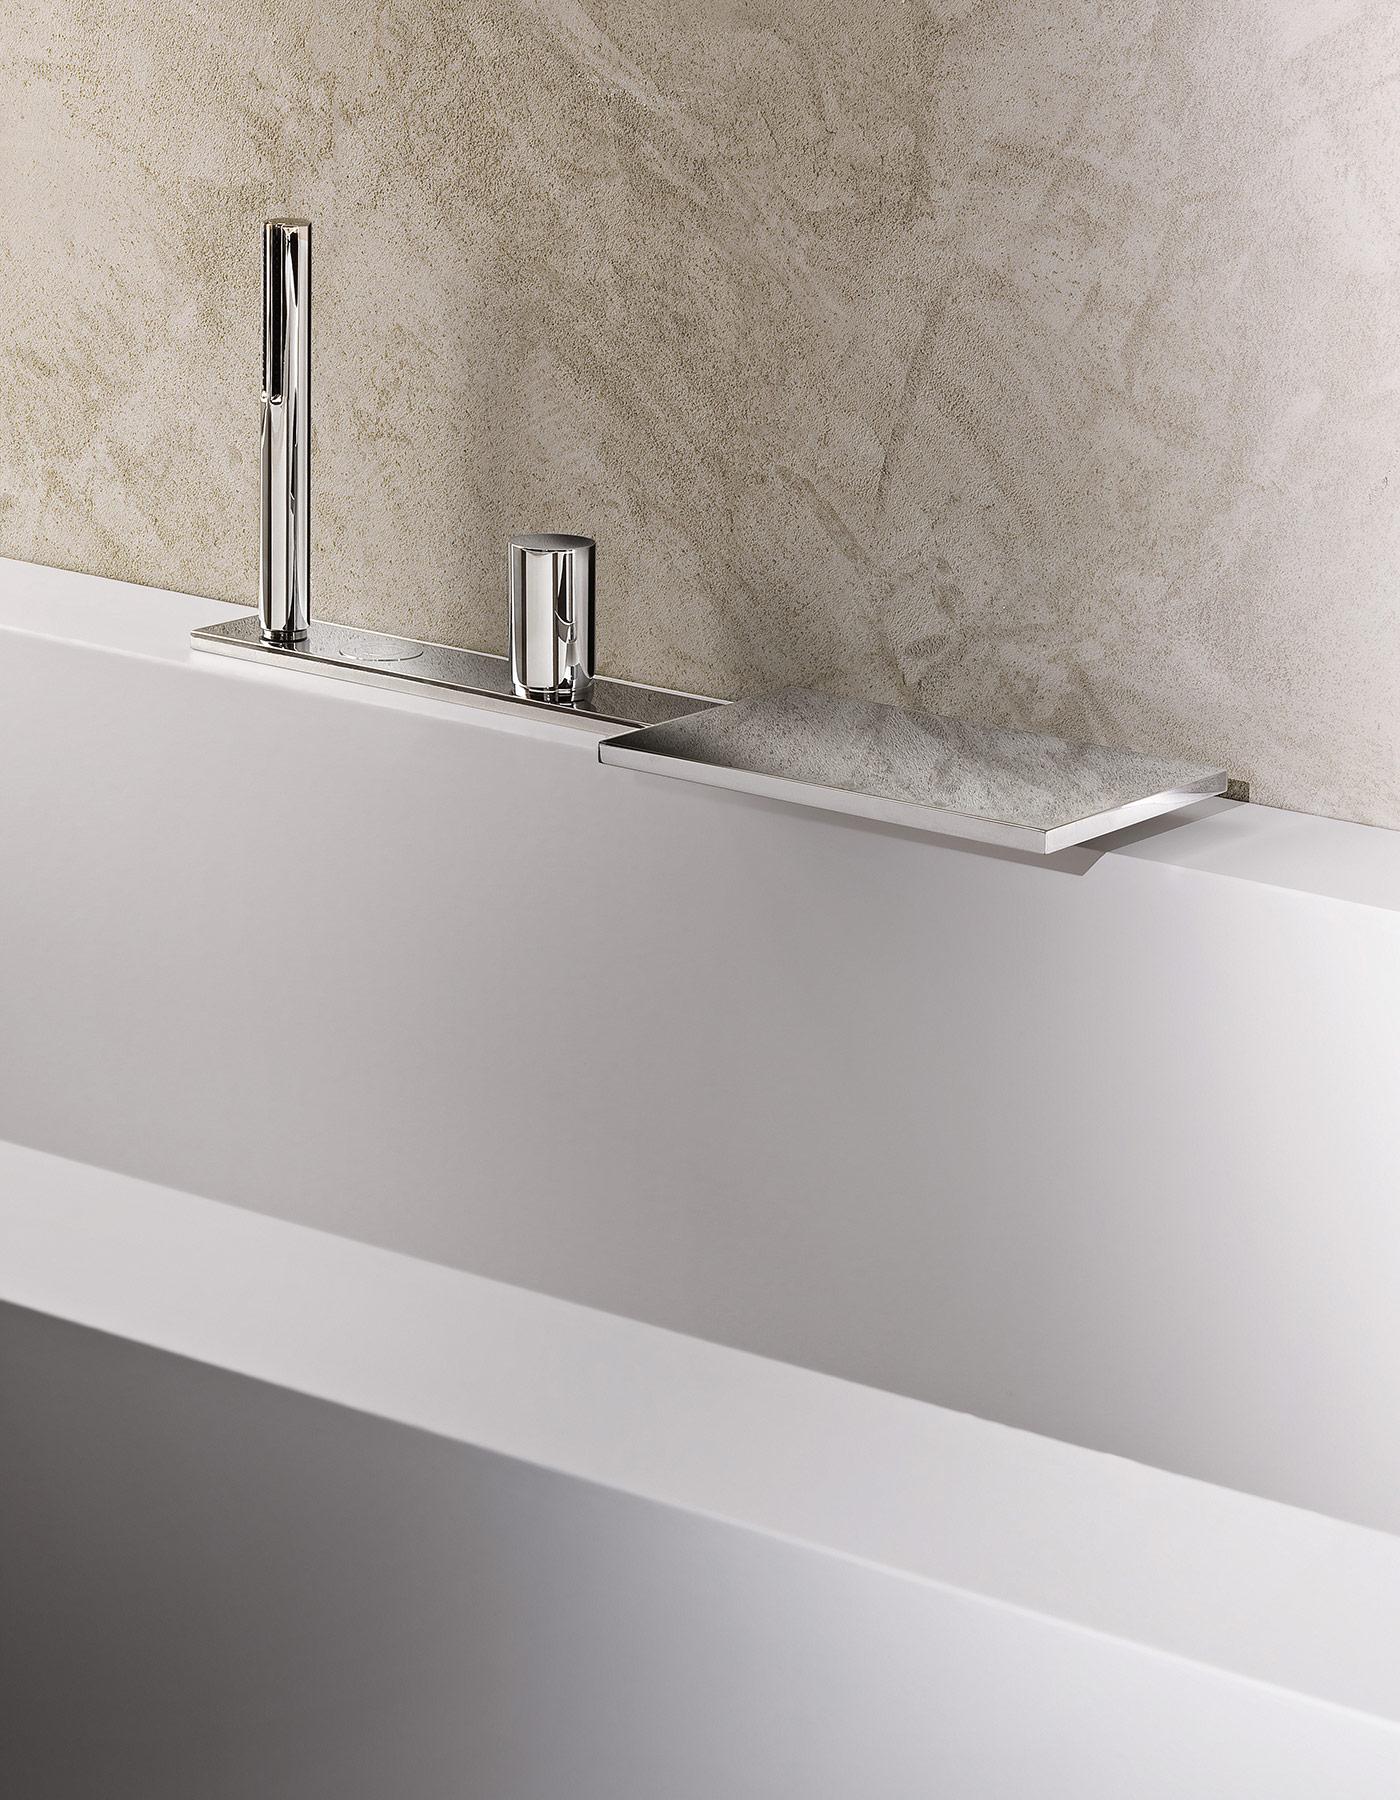 Contemporary Milano Deck Mount Tub Faucet